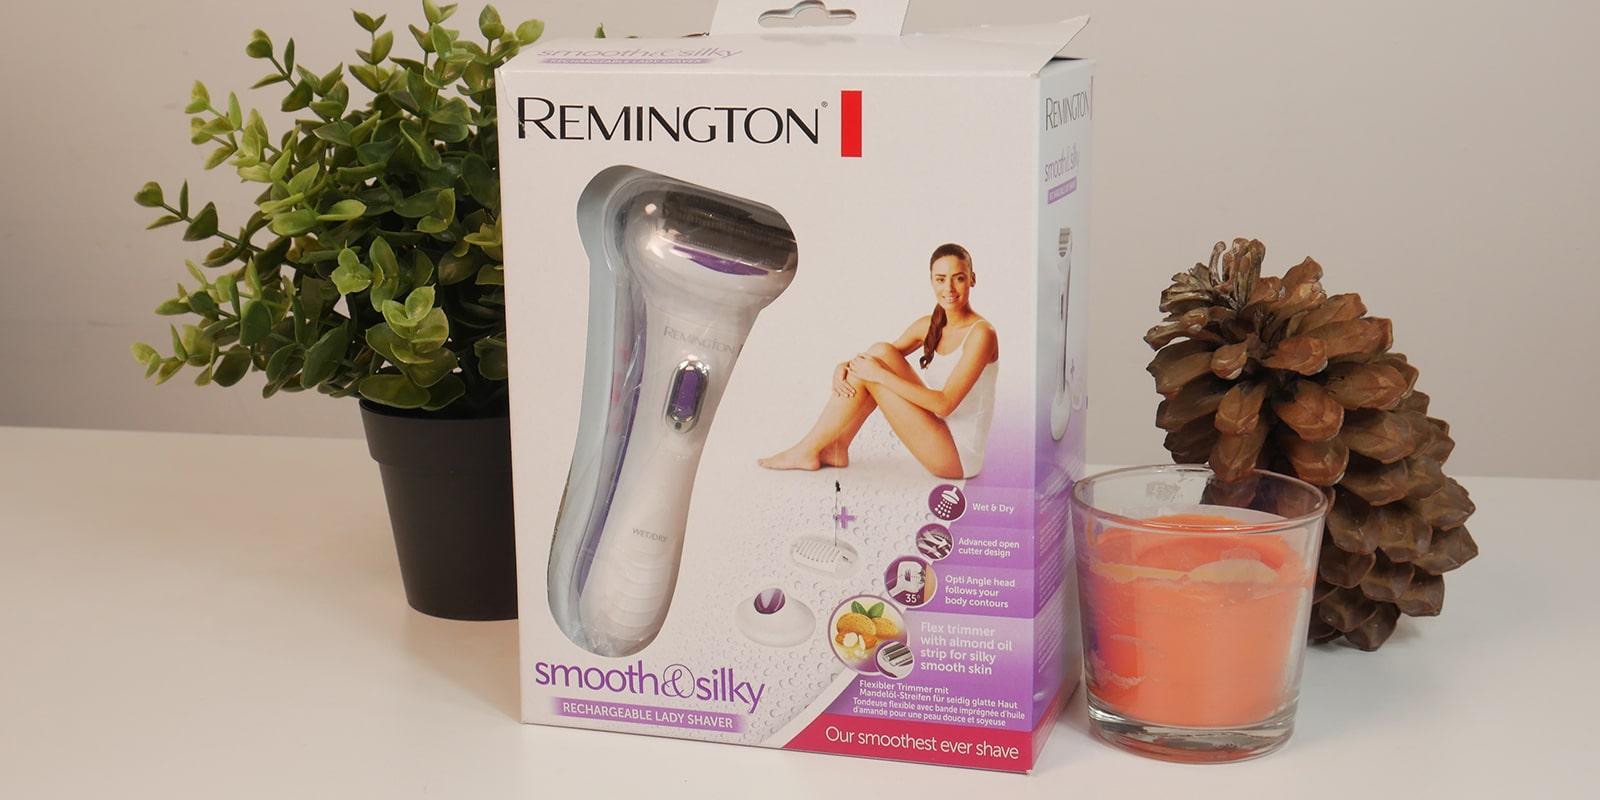 Remington Smooth & Silky